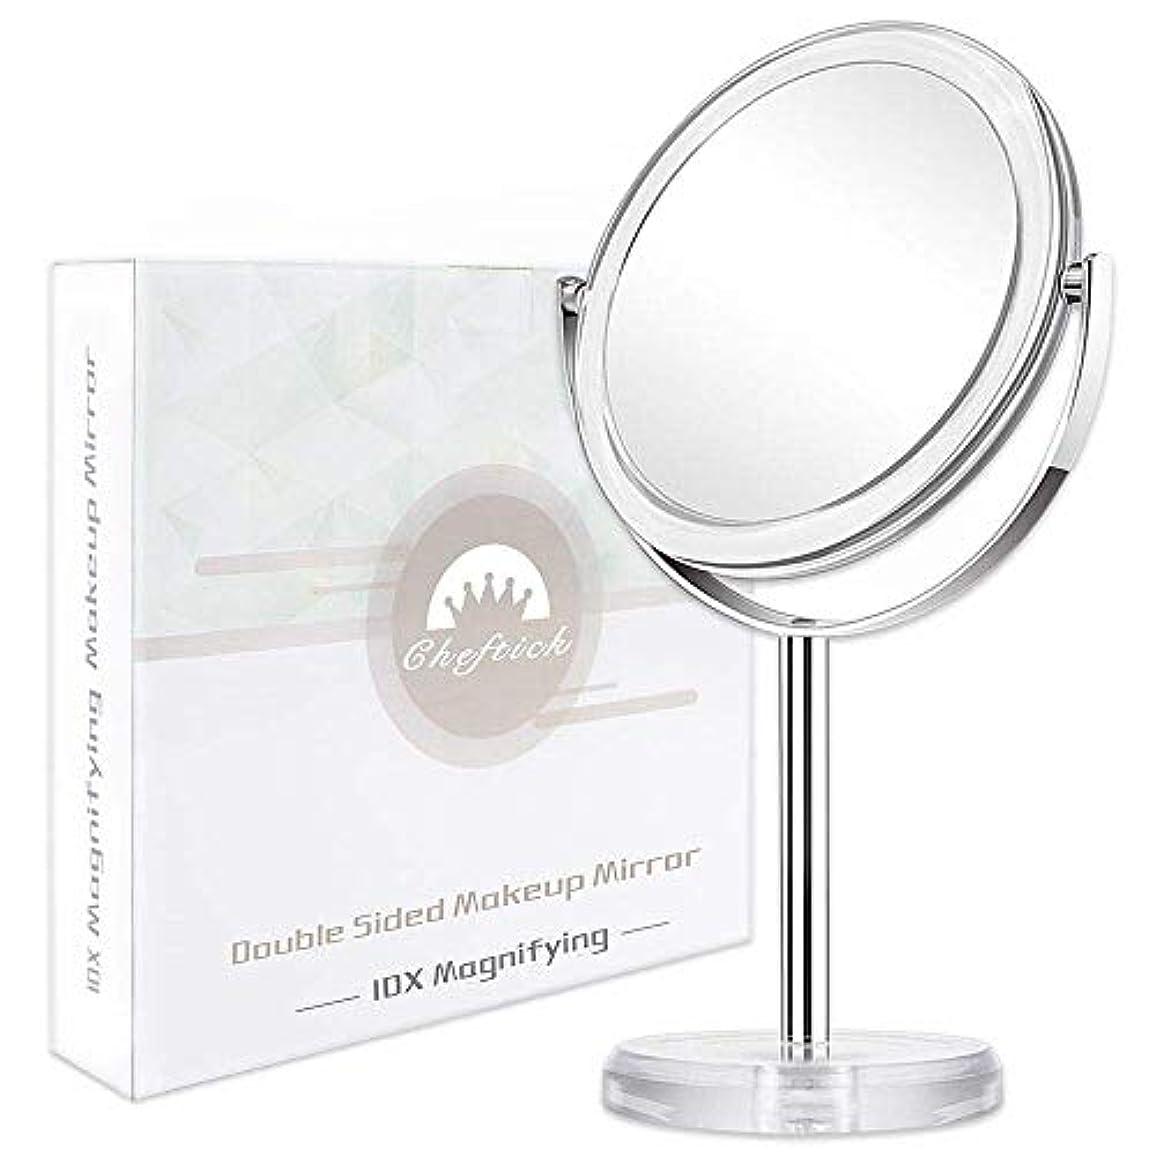 Cheftick 10倍&等倍両面鏡 化粧鏡 拡大鏡 スタンドミラー 360°回転 取り外せる